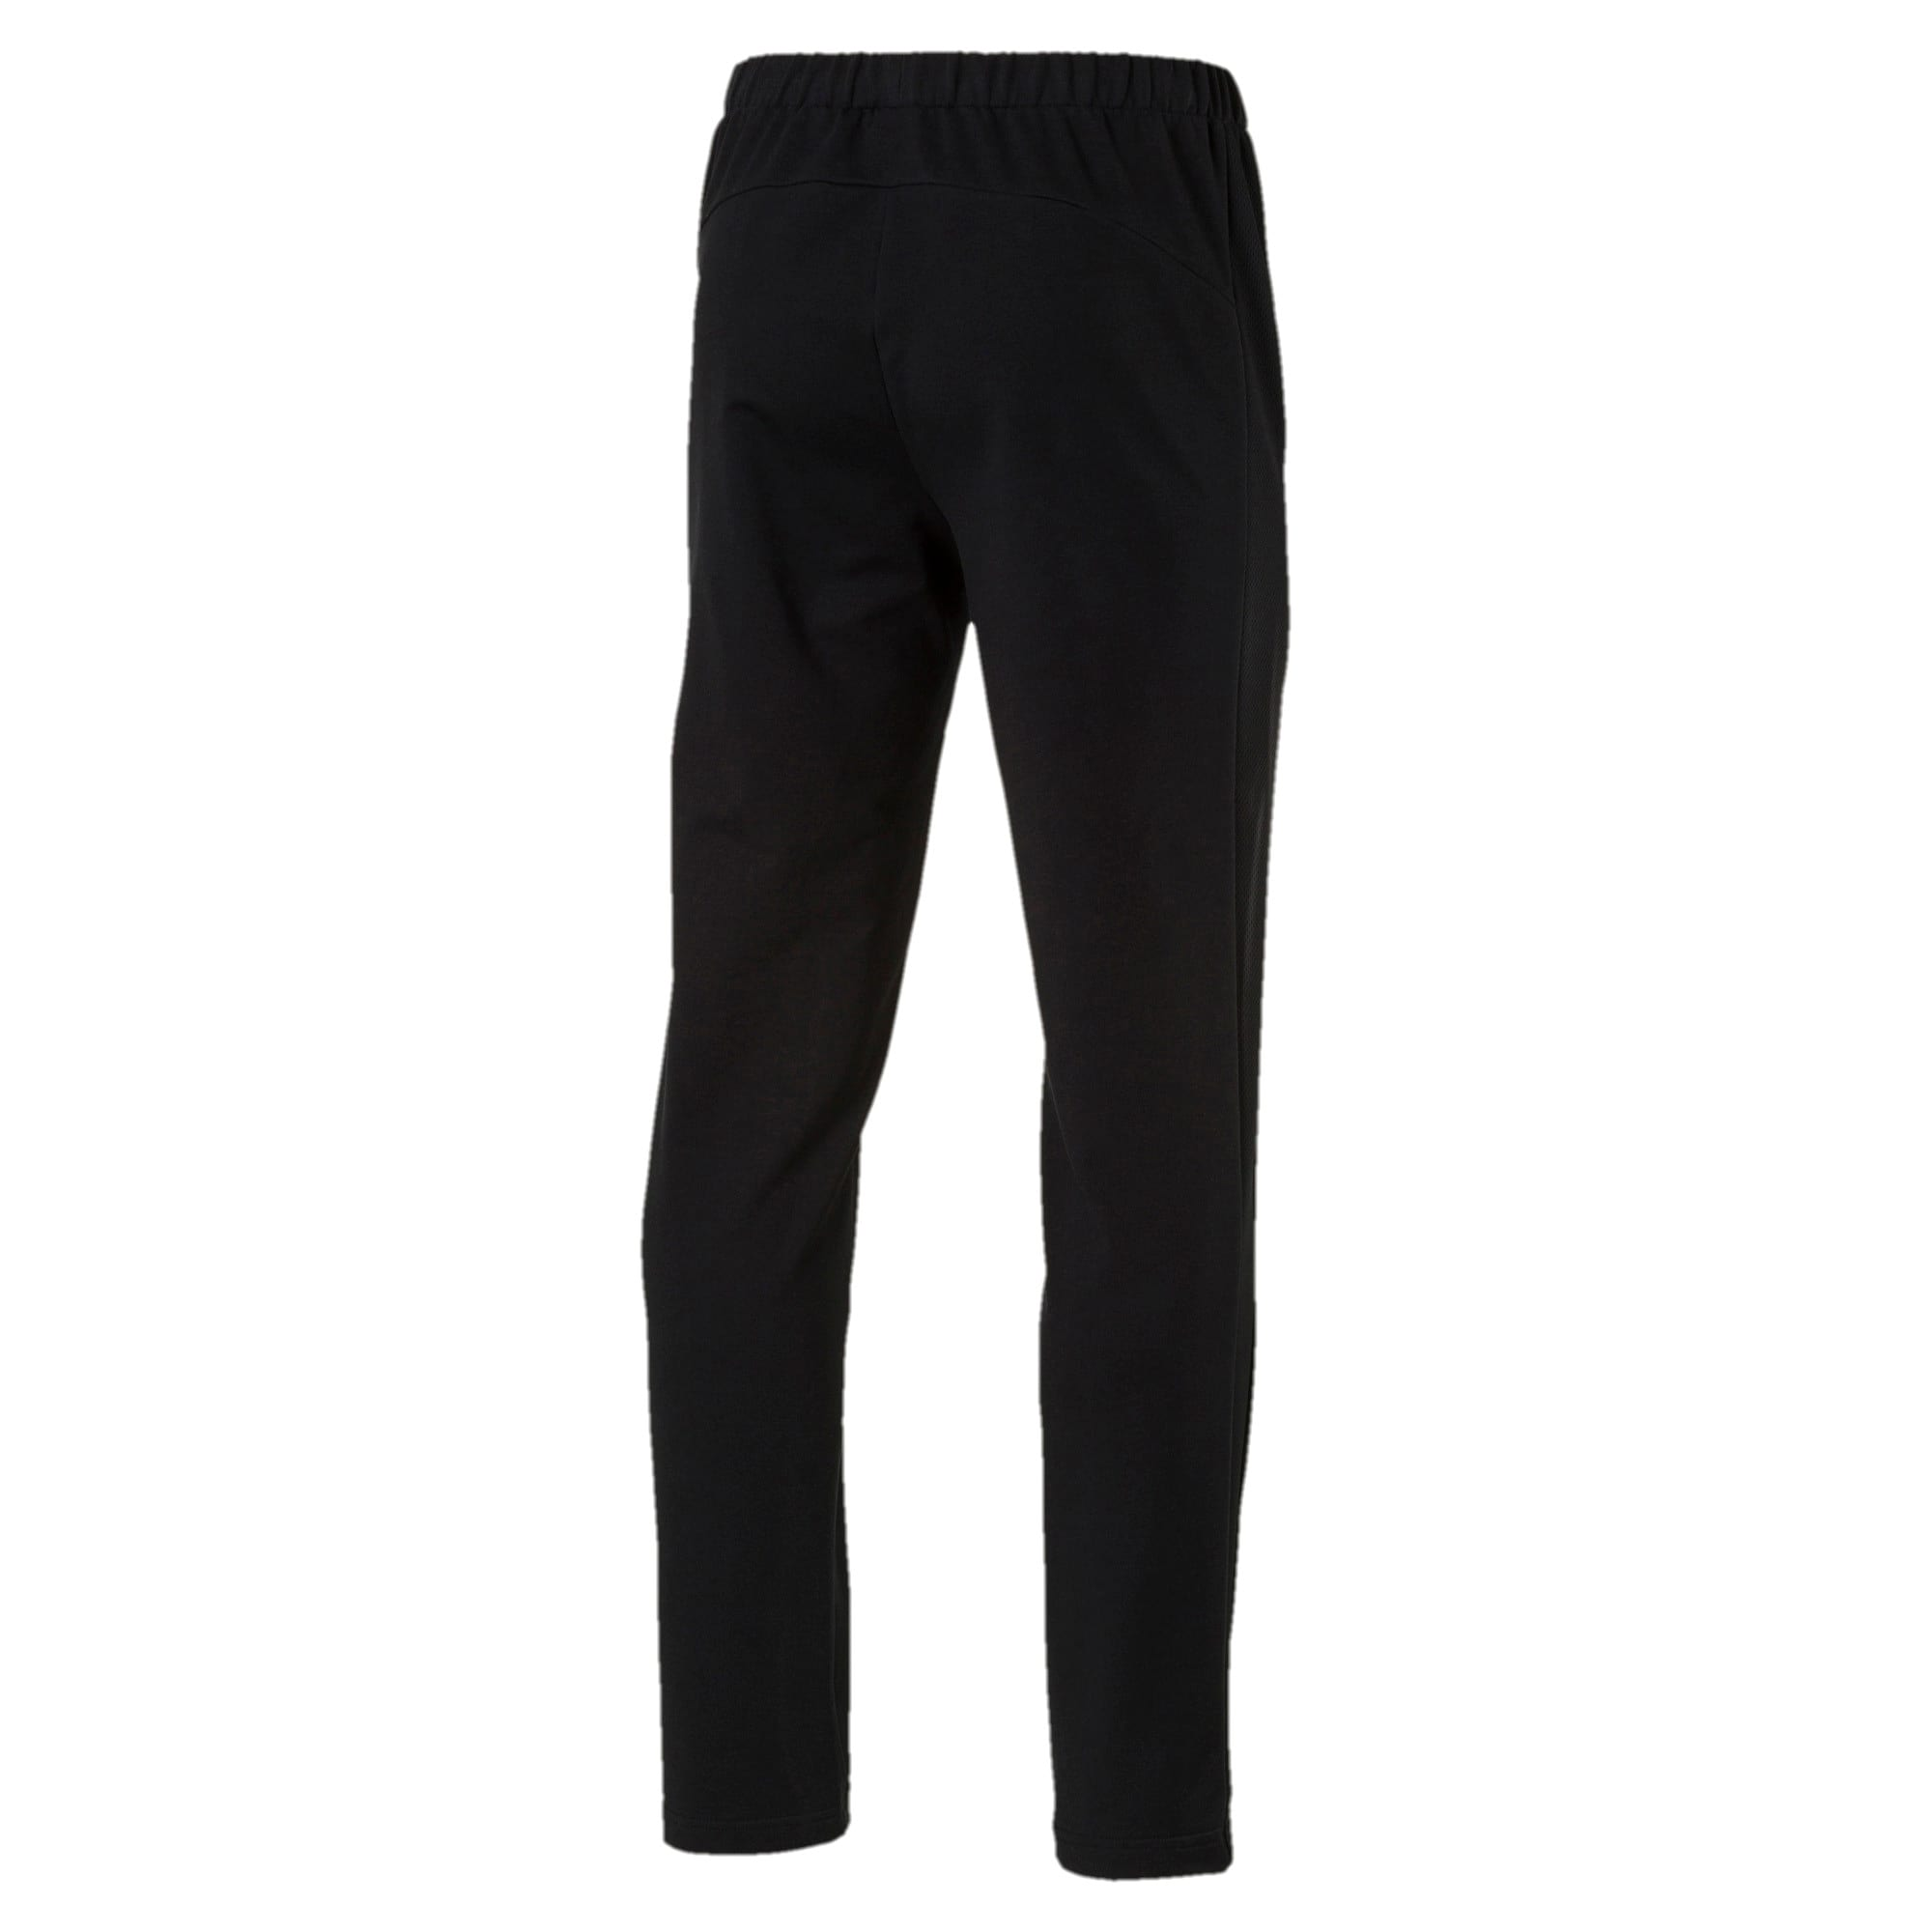 Thumbnail 2 of Stretch Lite Pants, Puma Black, medium